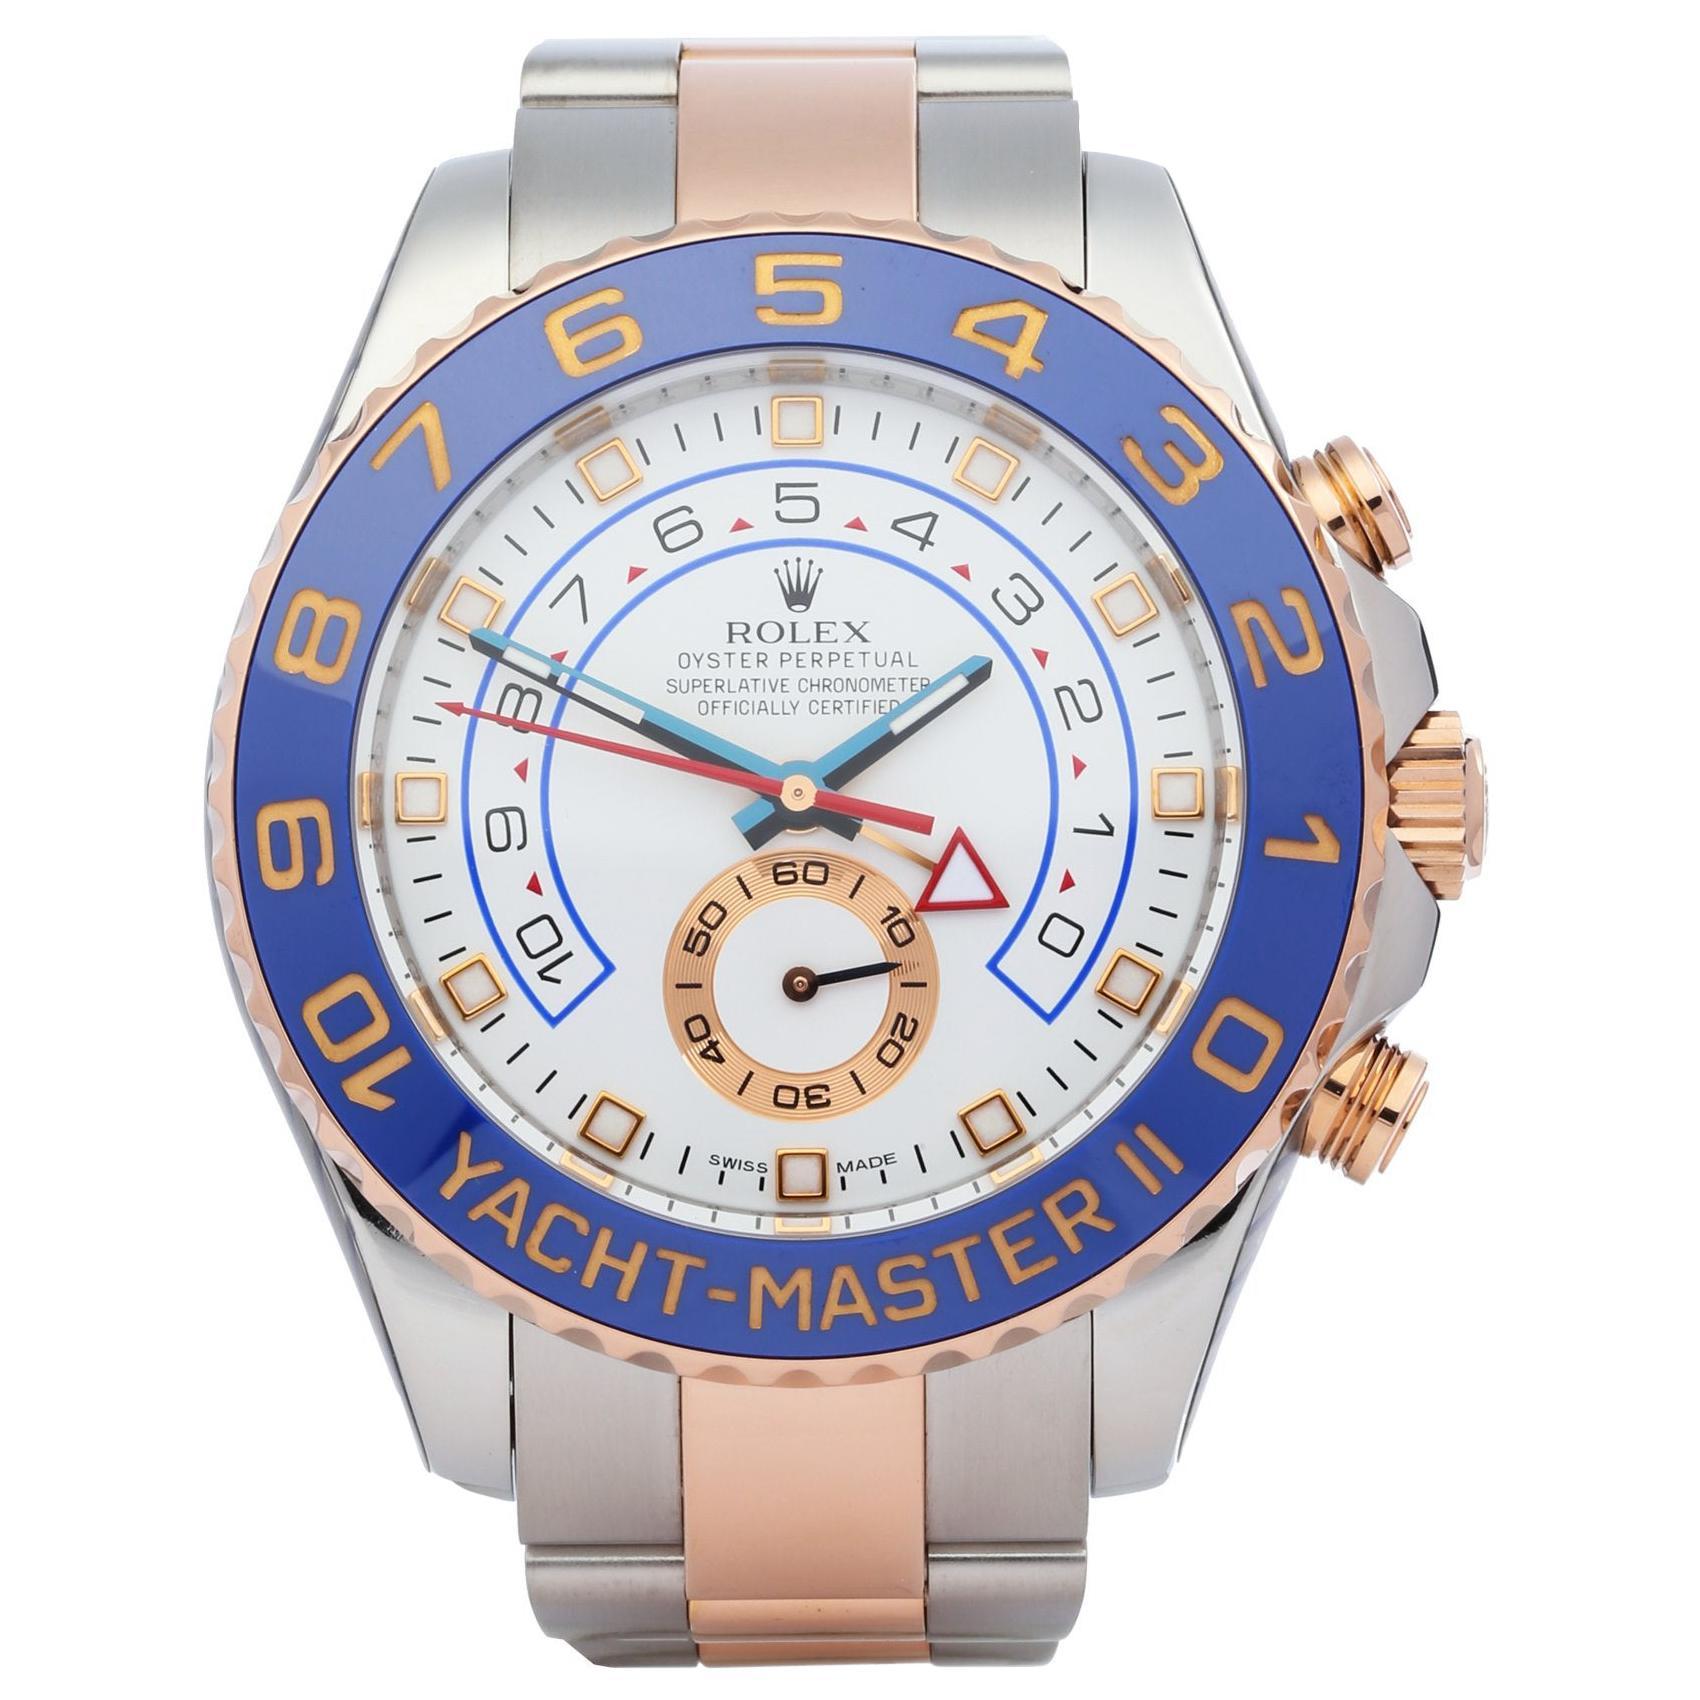 Rolex Yacht-Master II 0 116681 Men's Rose Gold & Stainless Steel 0 Watch